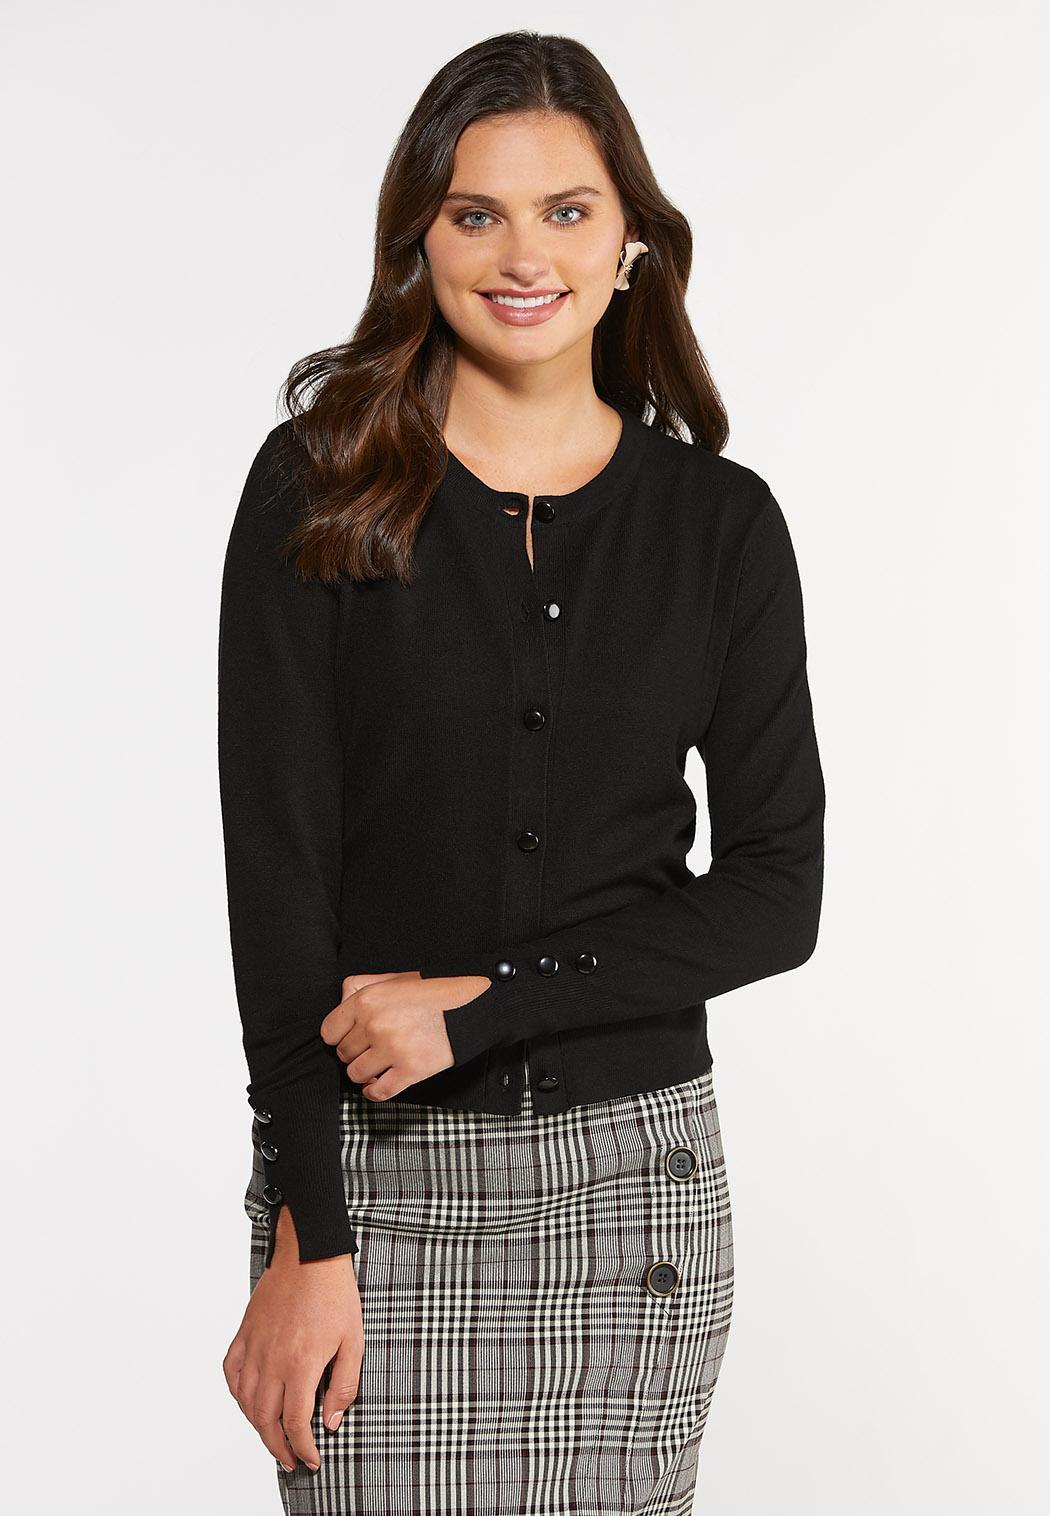 Plus Size Classic Black Cardigan Sweater